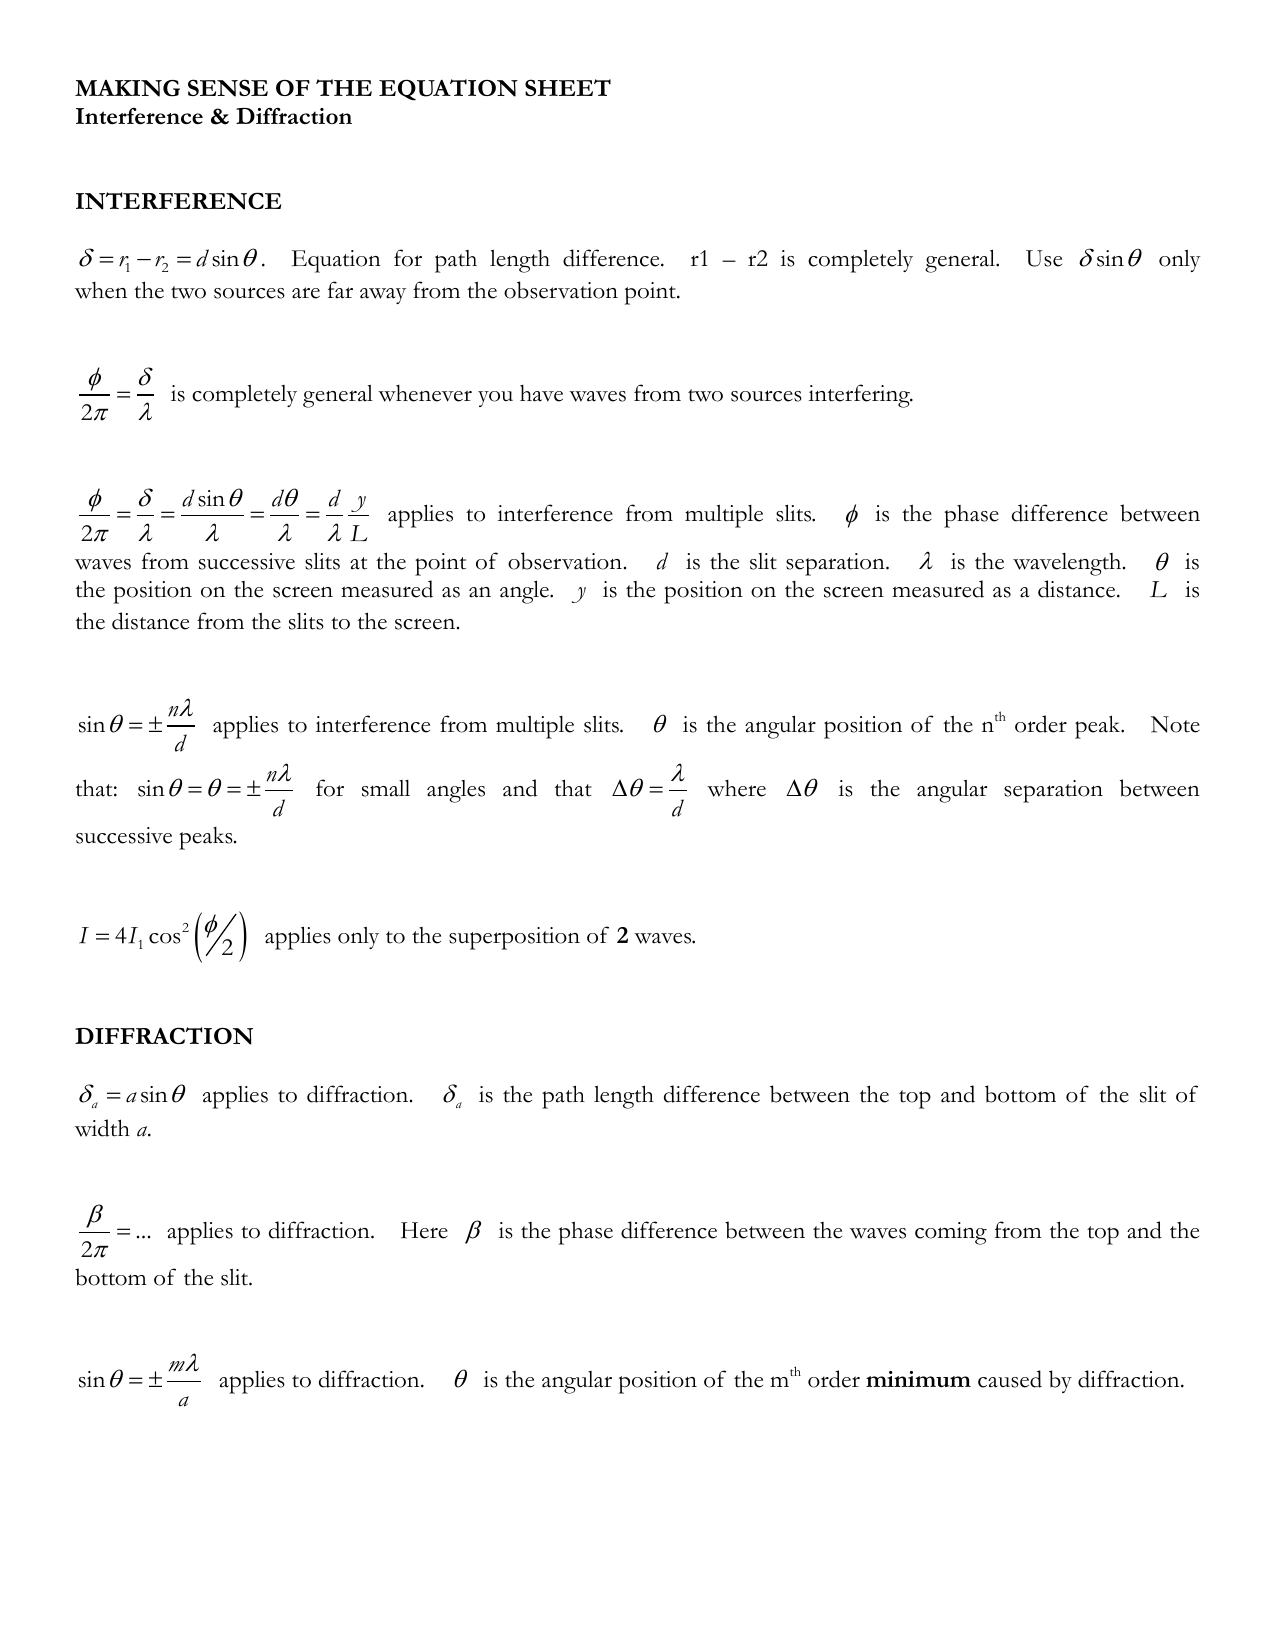 Formula sheet guide: FormulaCheatSheet